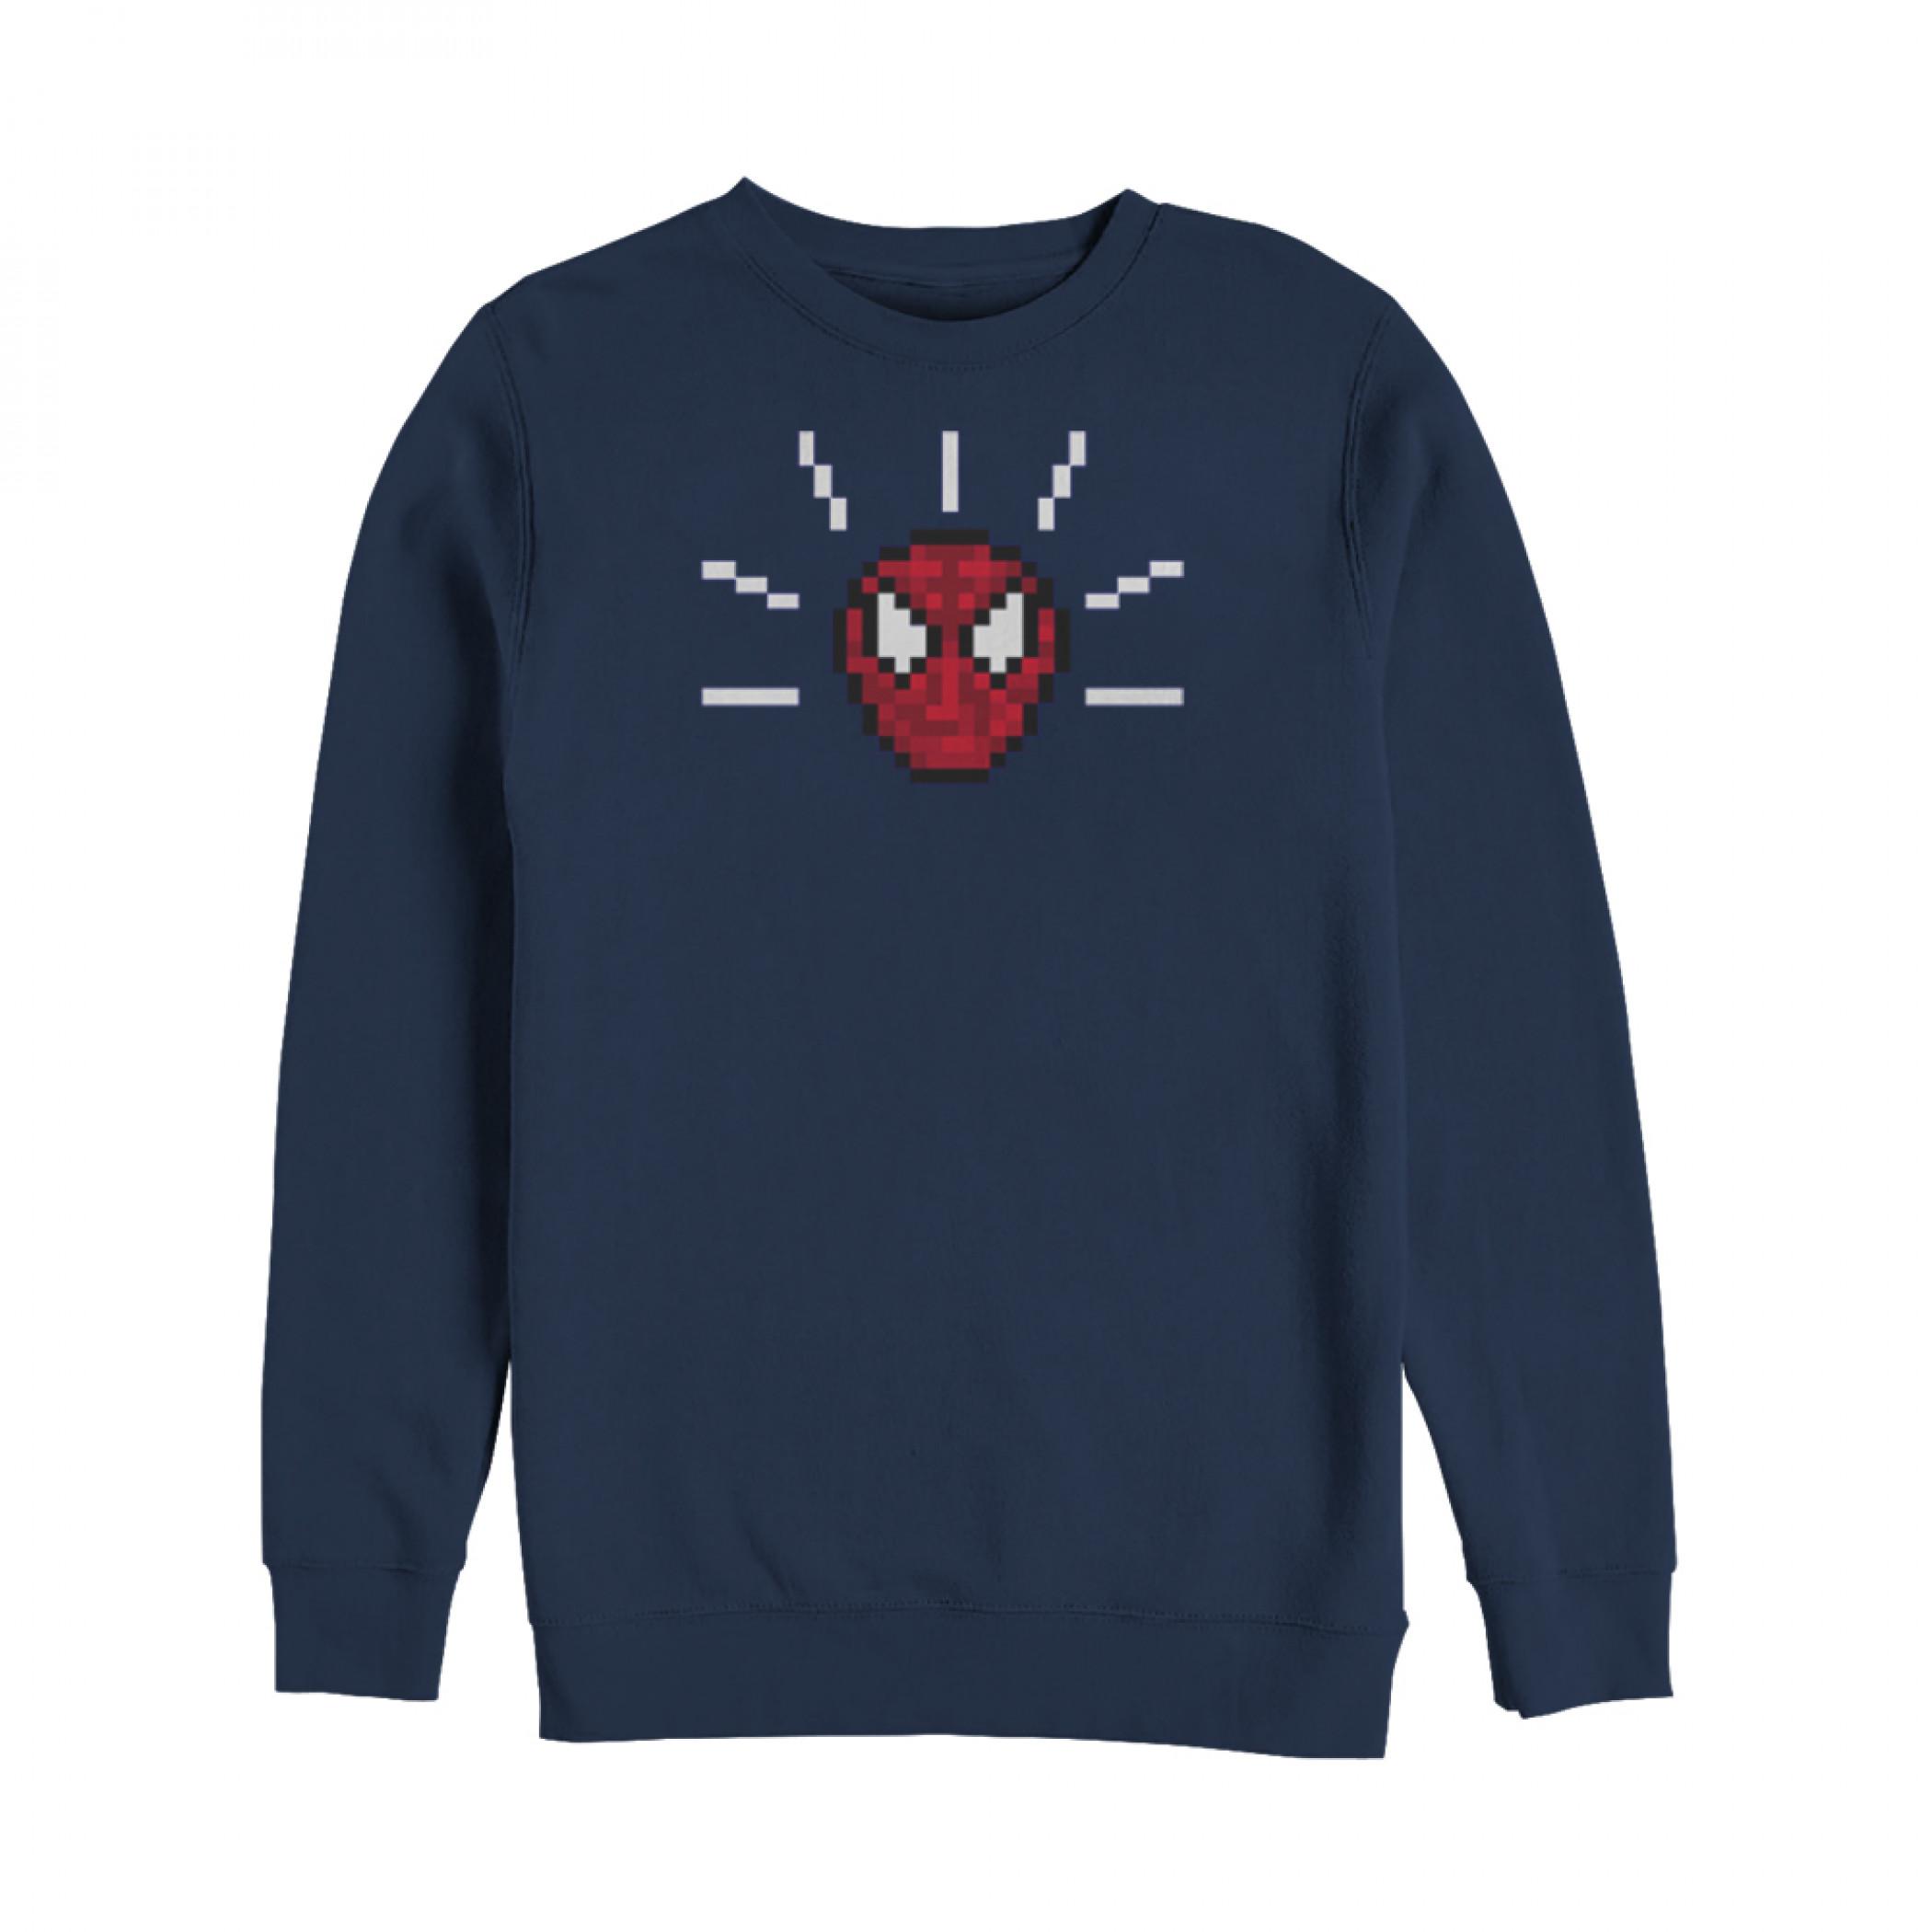 Marvel Pixelated Spider-Man Mask Sweatshirt